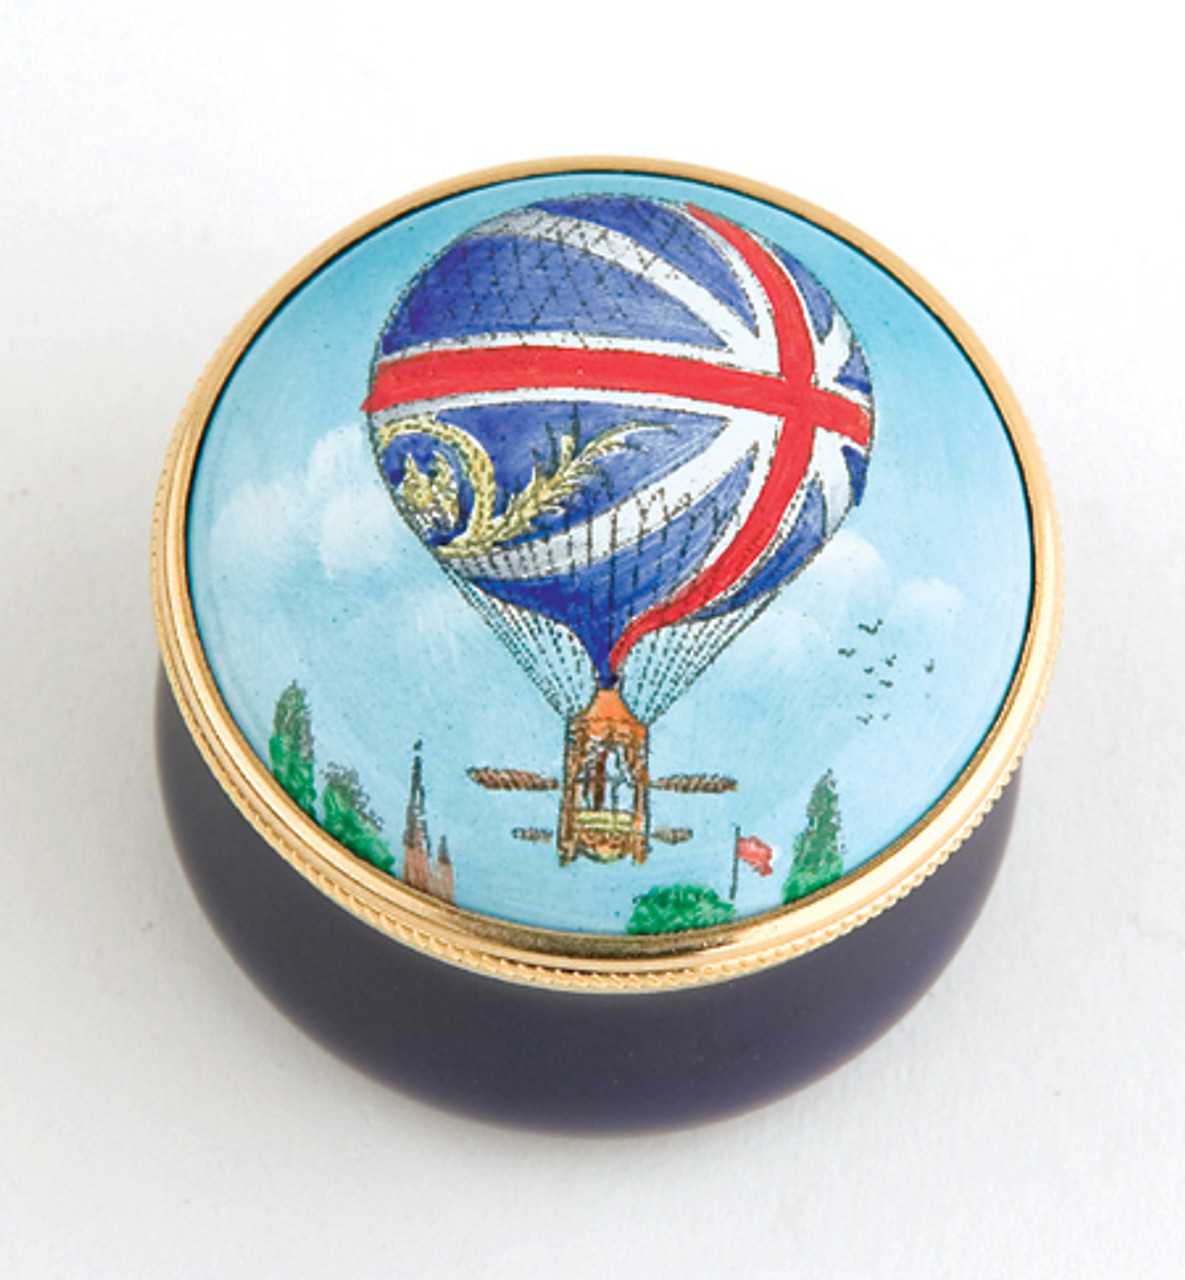 Staffordshire Balloon (03-254)